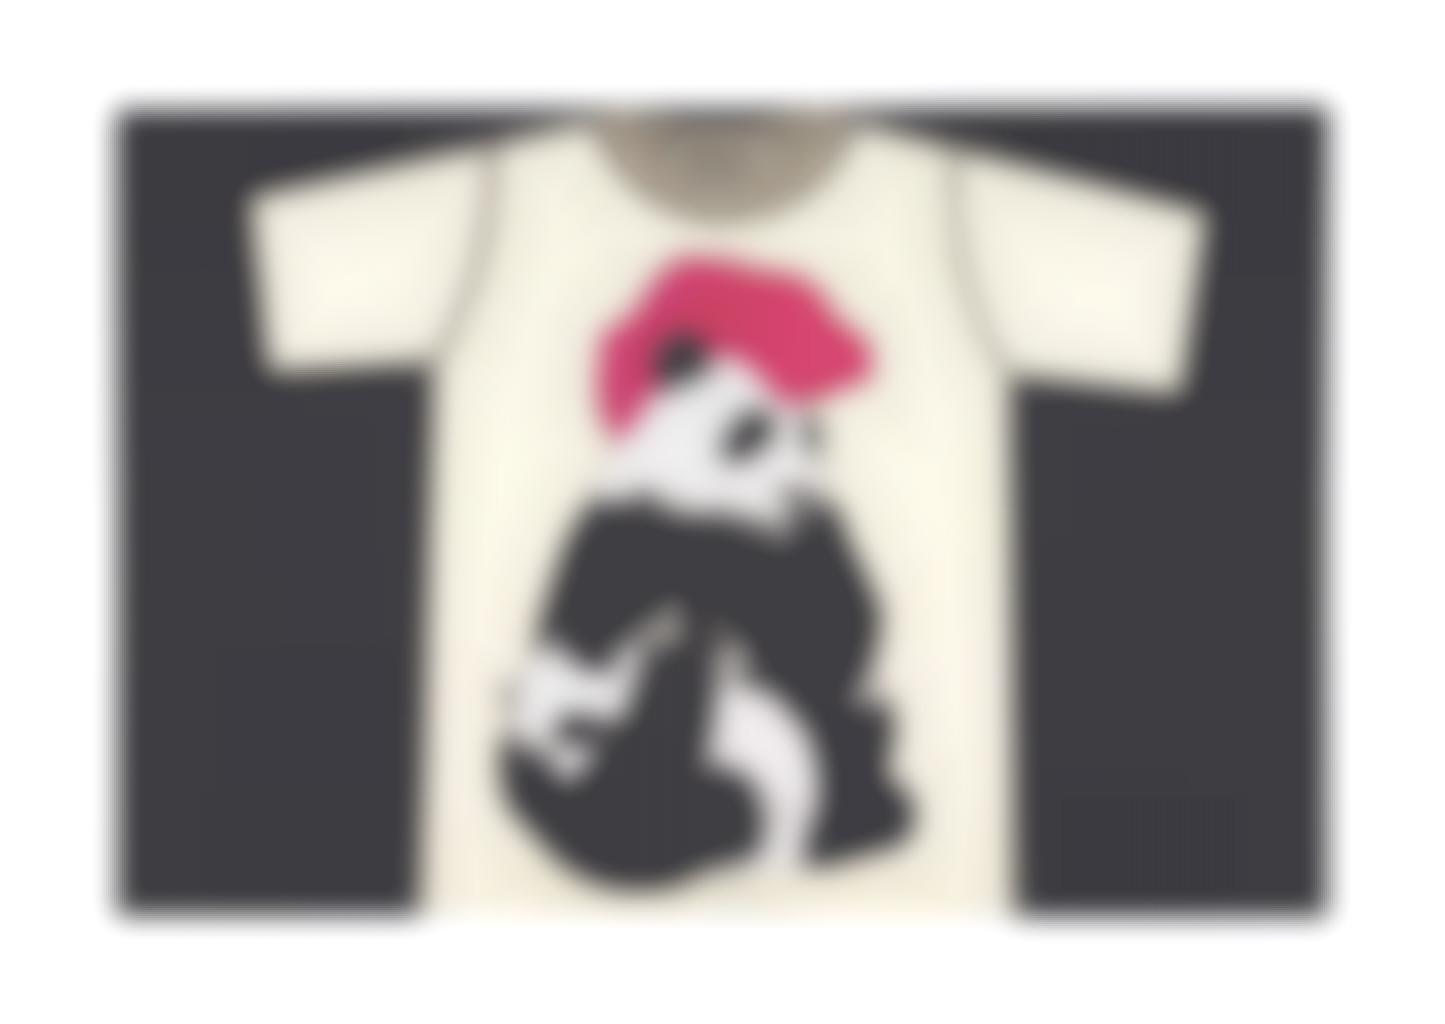 Rob Pruitt-Panda T-Shirt: Madonna with a Mohawk and Child-2011